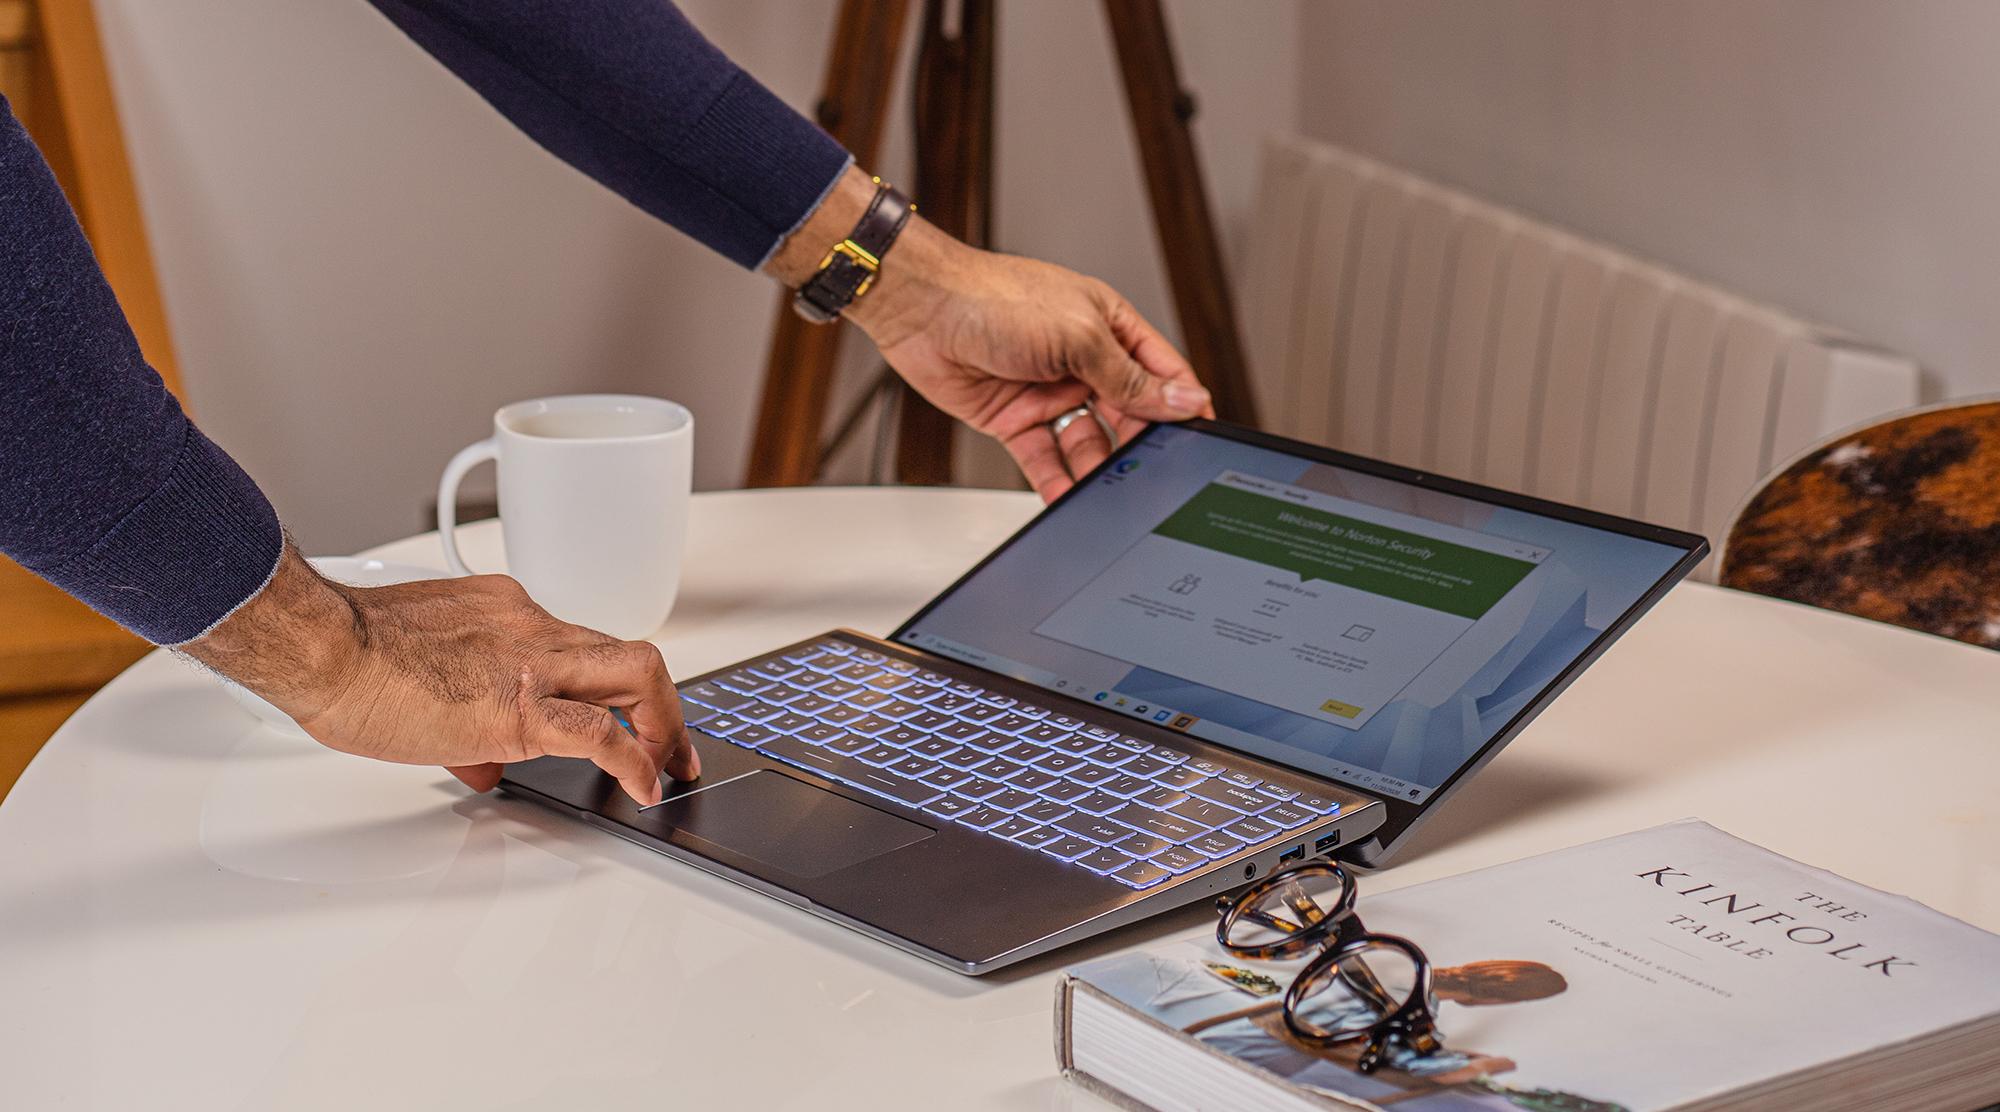 notebook手提電腦推介,筆記型電腦文書機-180度翻轉功能|MSI 微星香港 Modern 14 系列